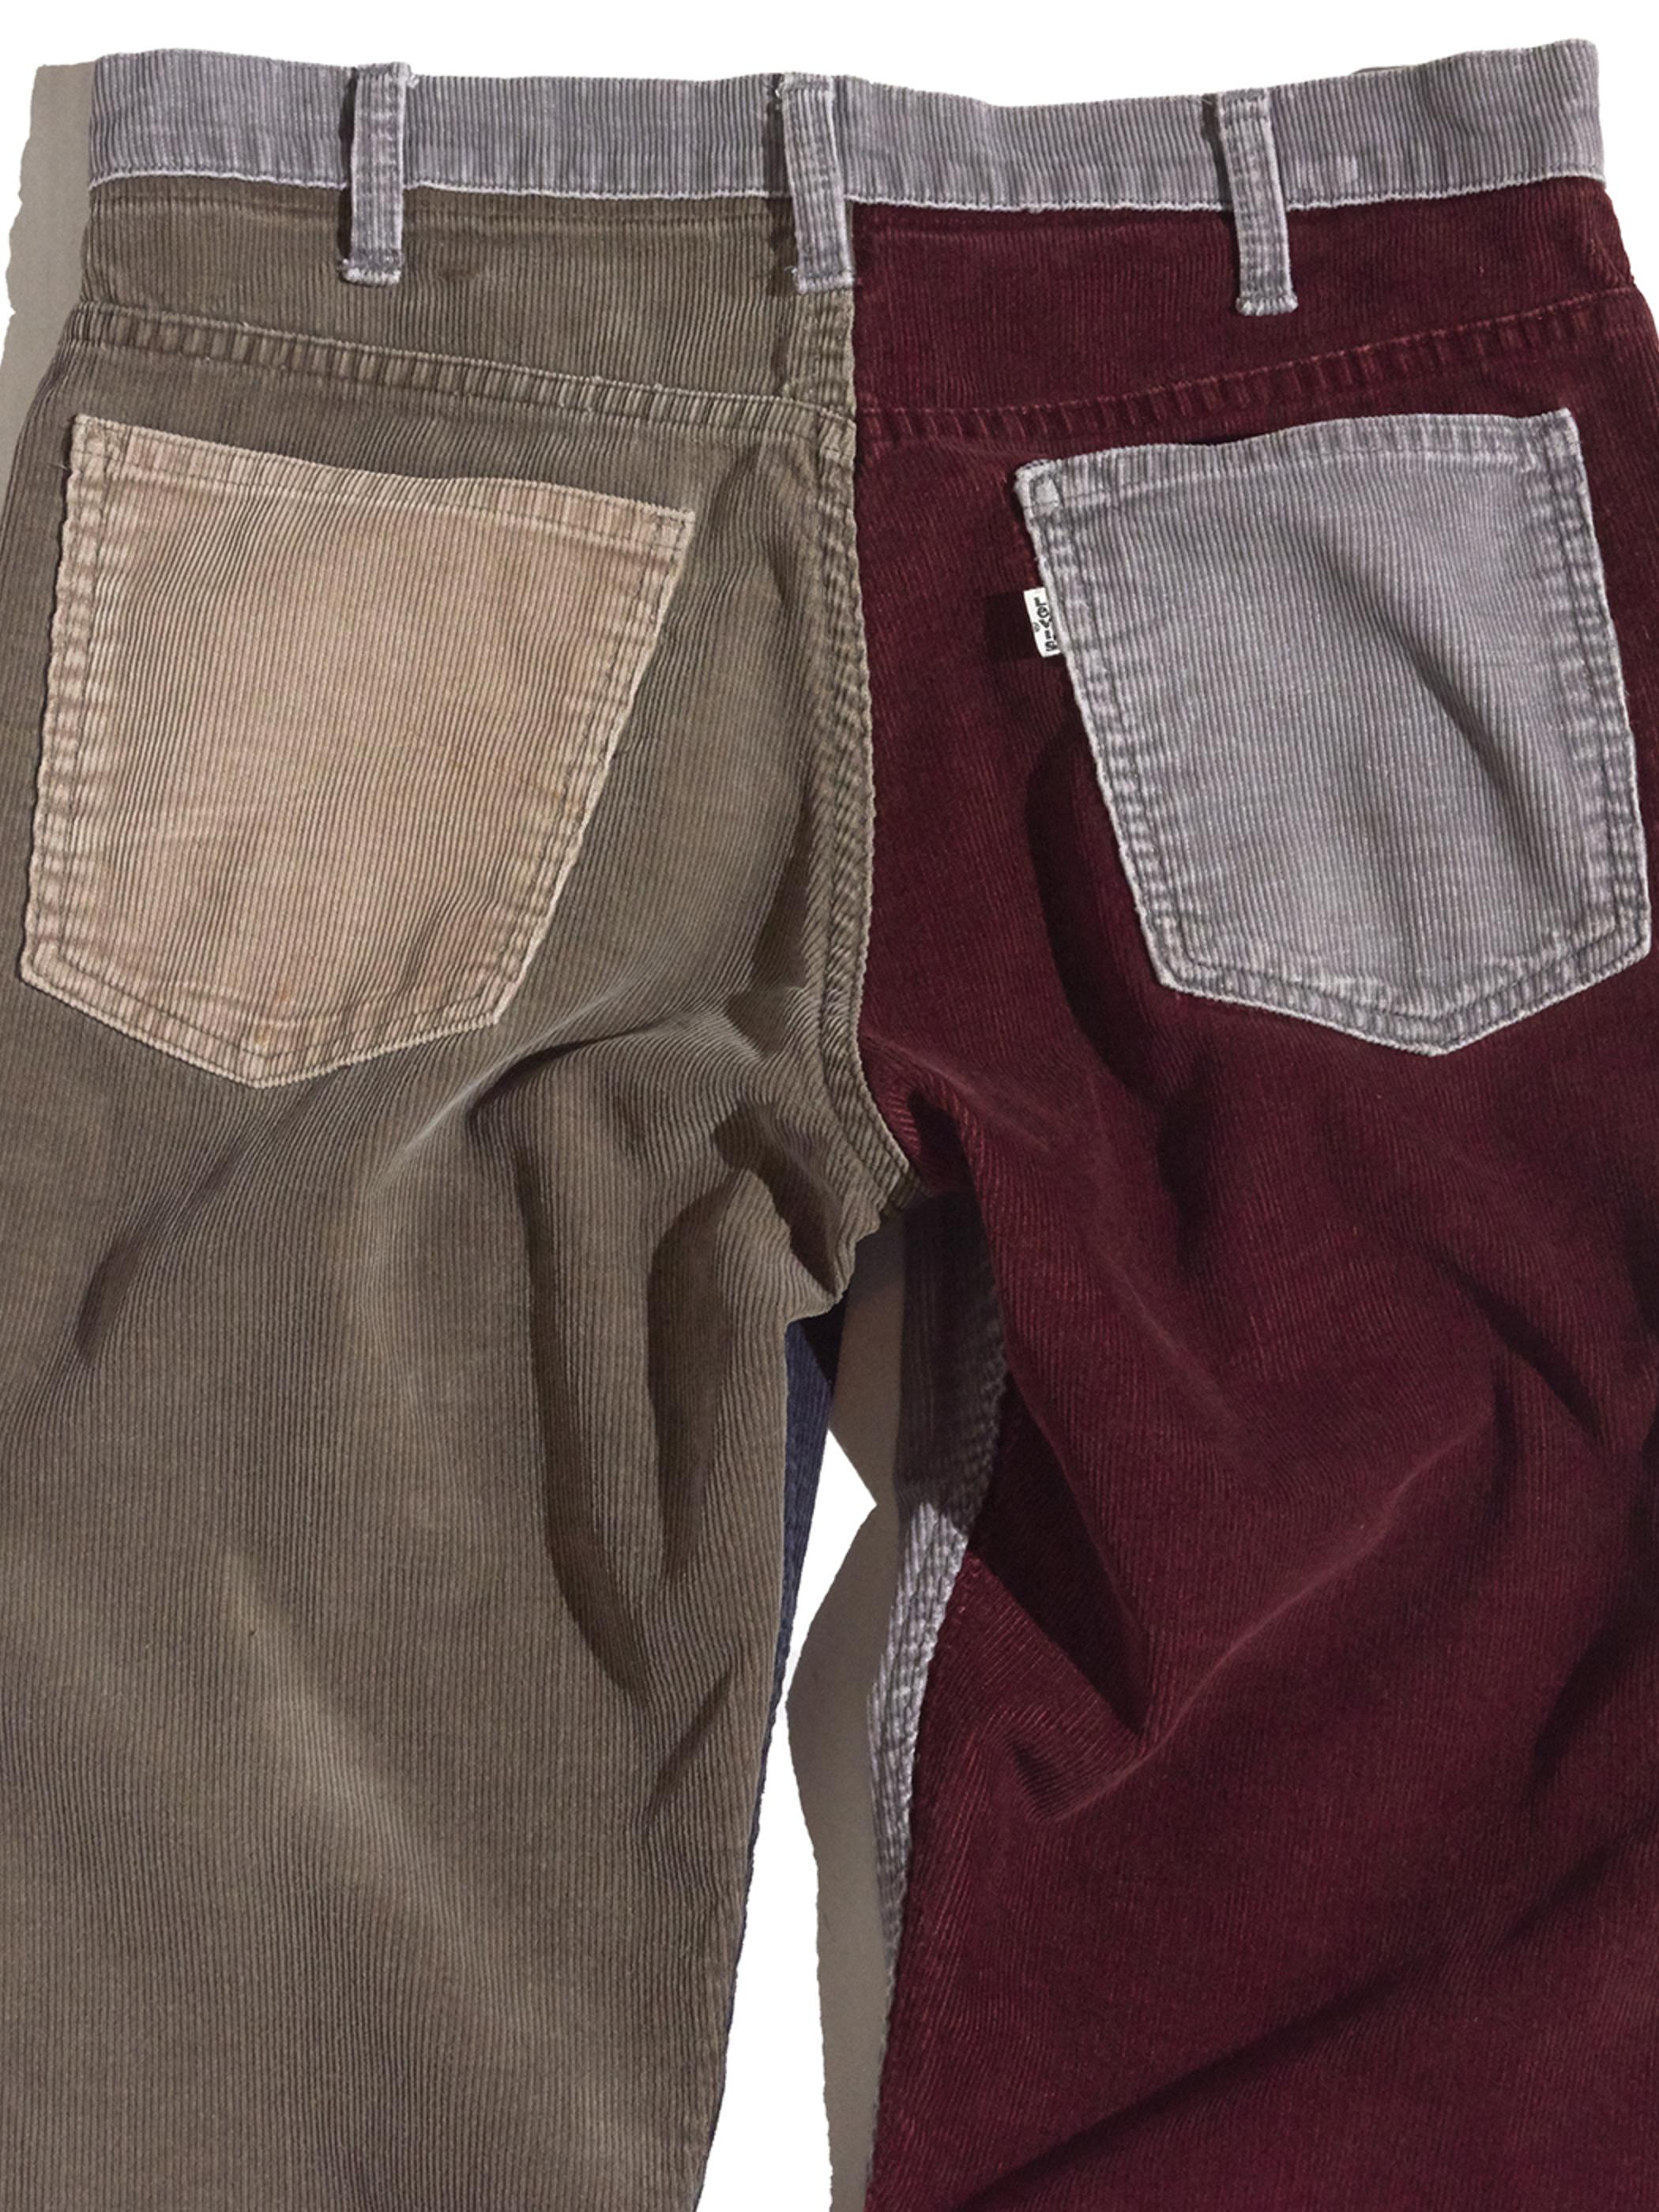 "1980s ""Levi's"" custom mede crazy pettern 519 corduroy pants #12"